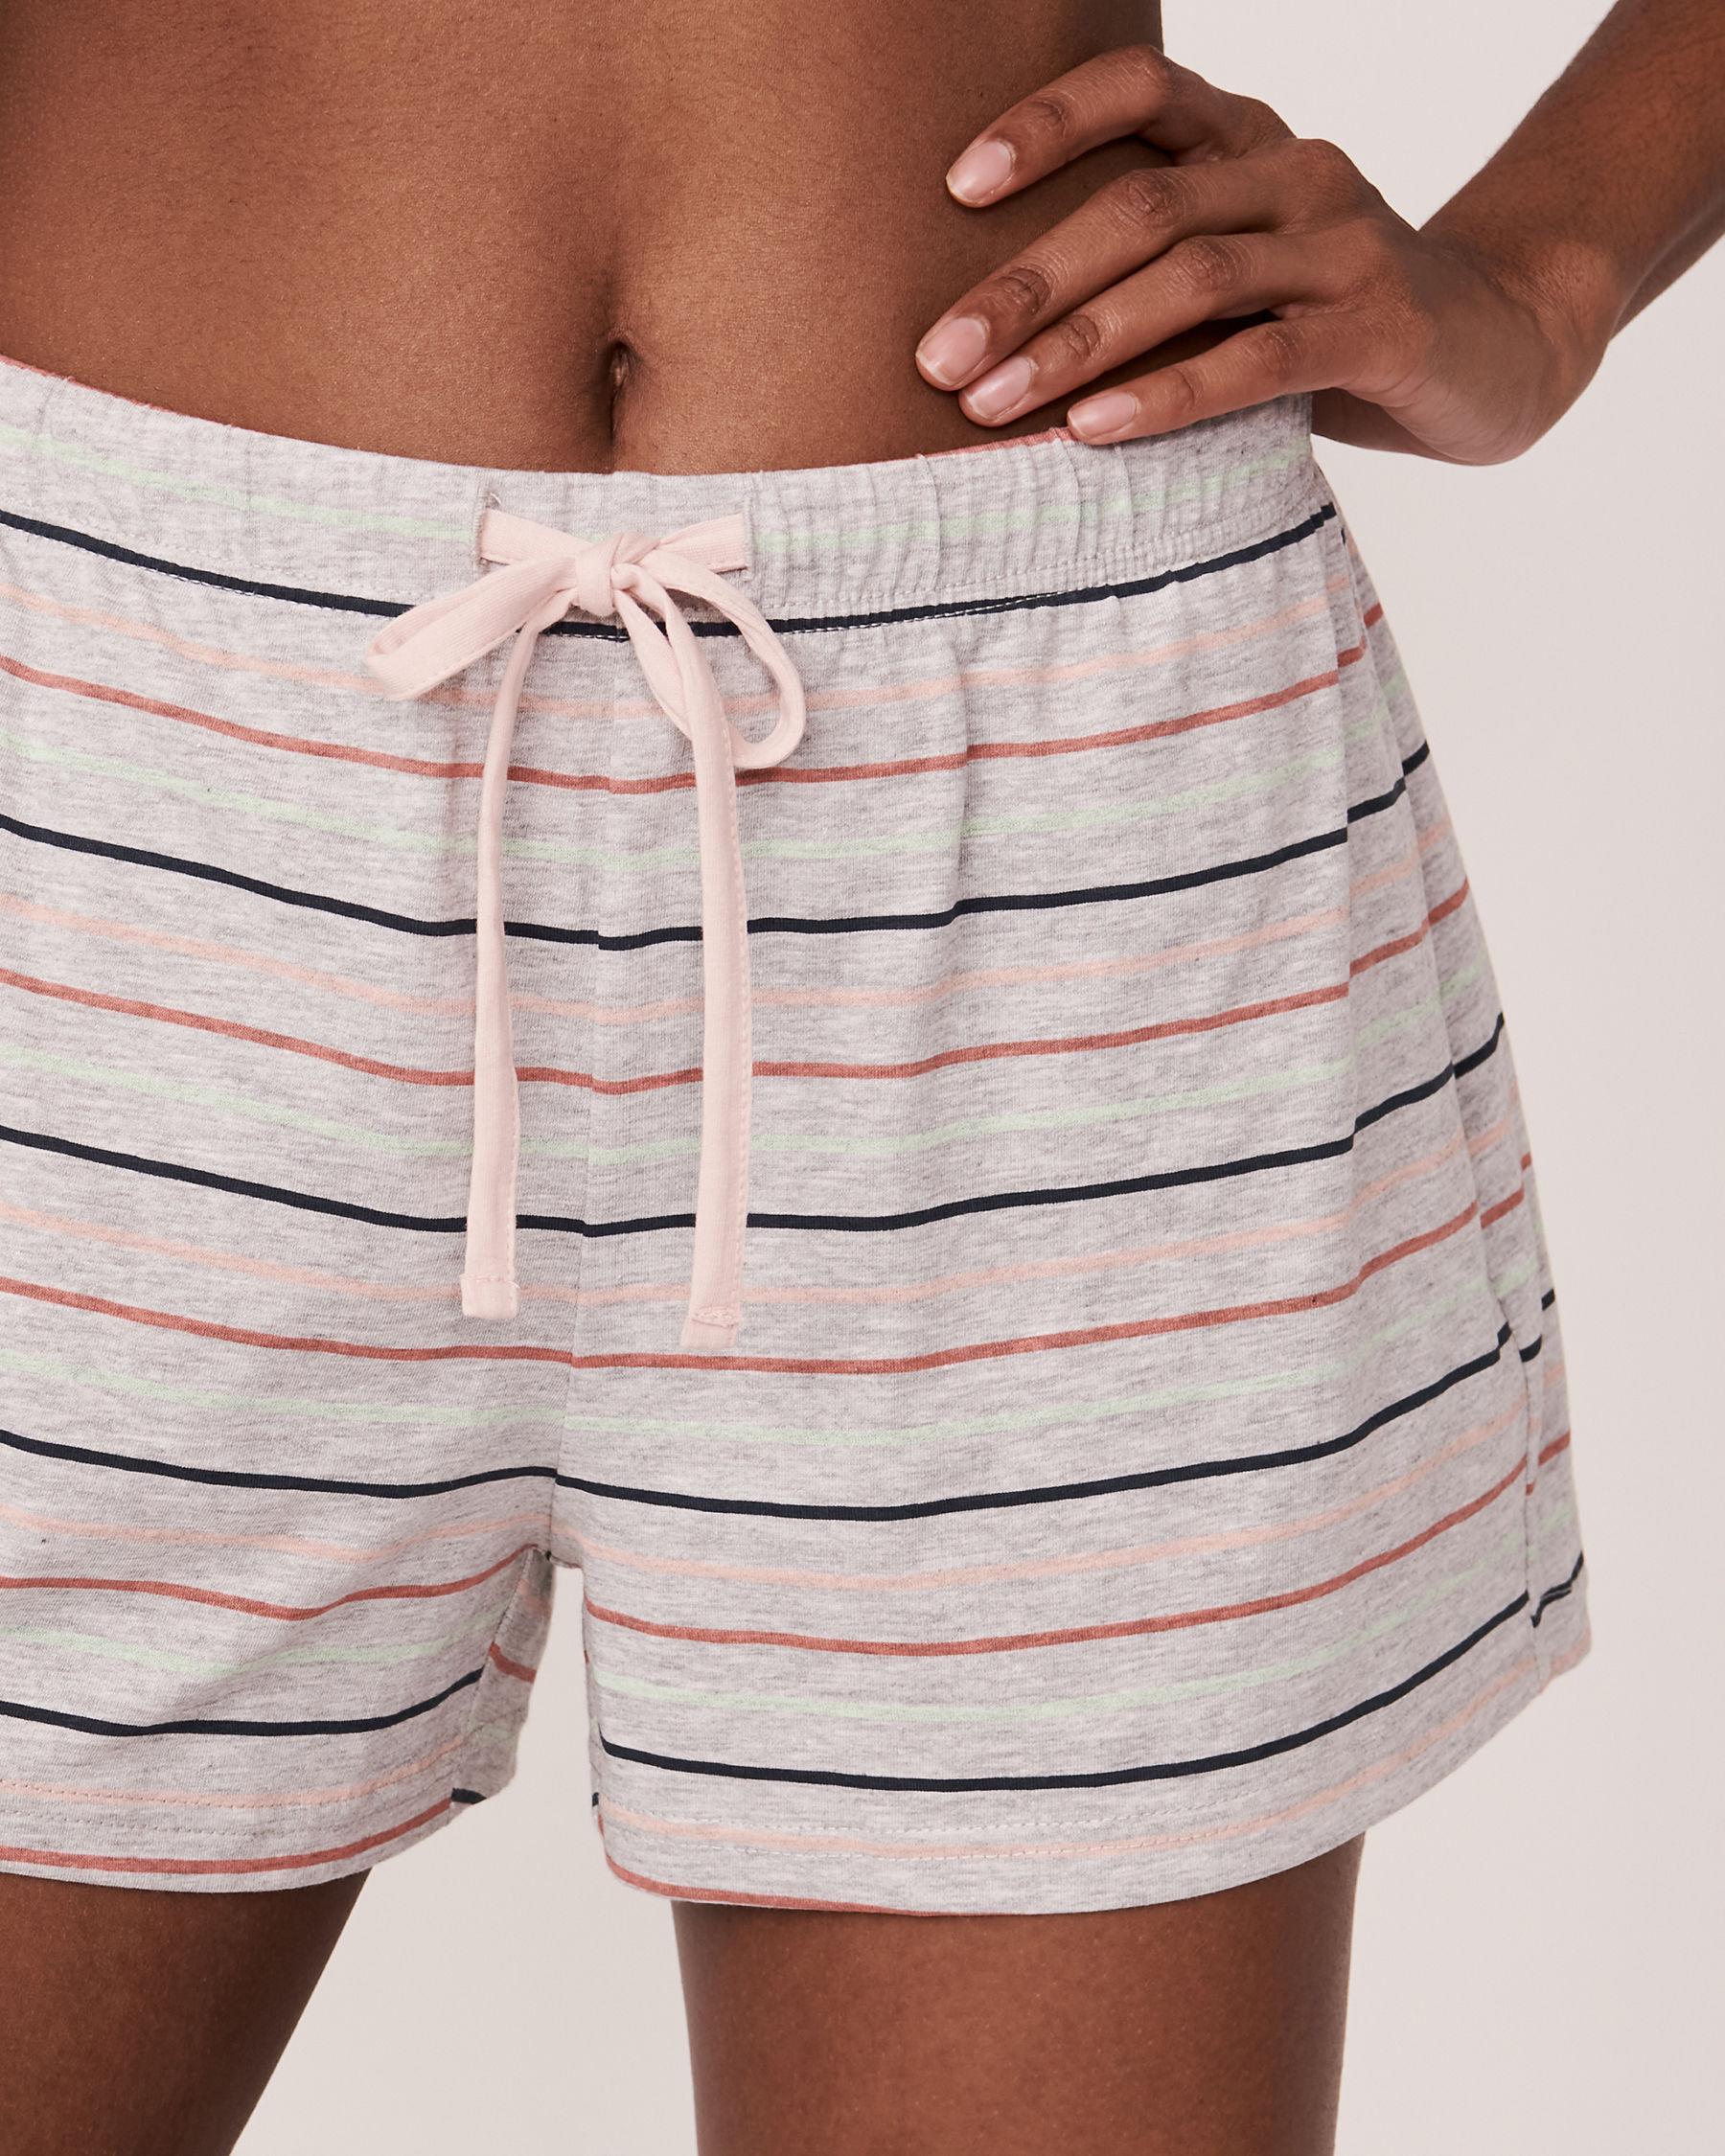 LA VIE EN ROSE Pyjama Short with Drawstring Multi stripe mix 40200107 - View1